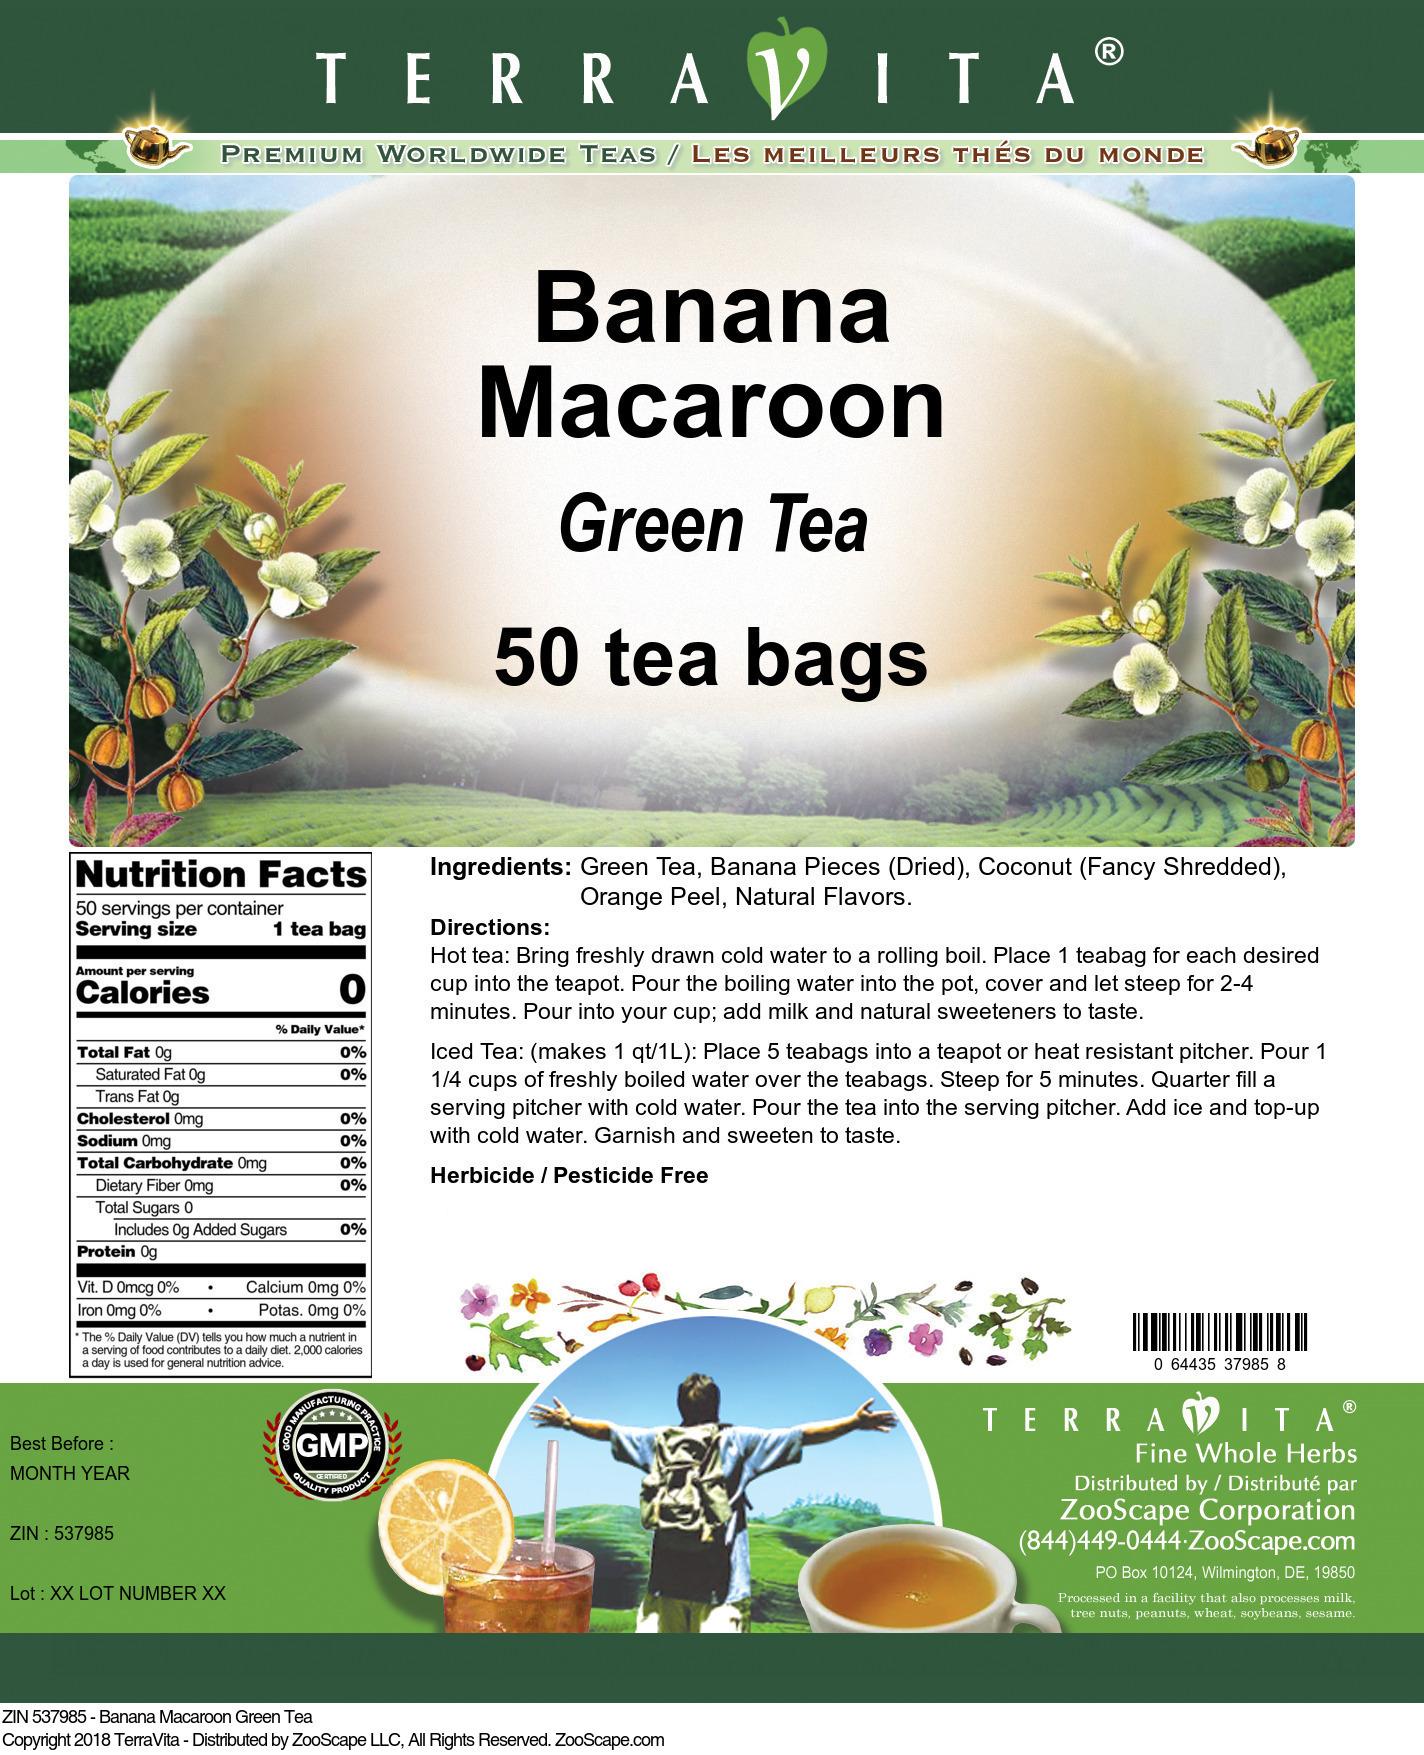 Banana Macaroon Green Tea